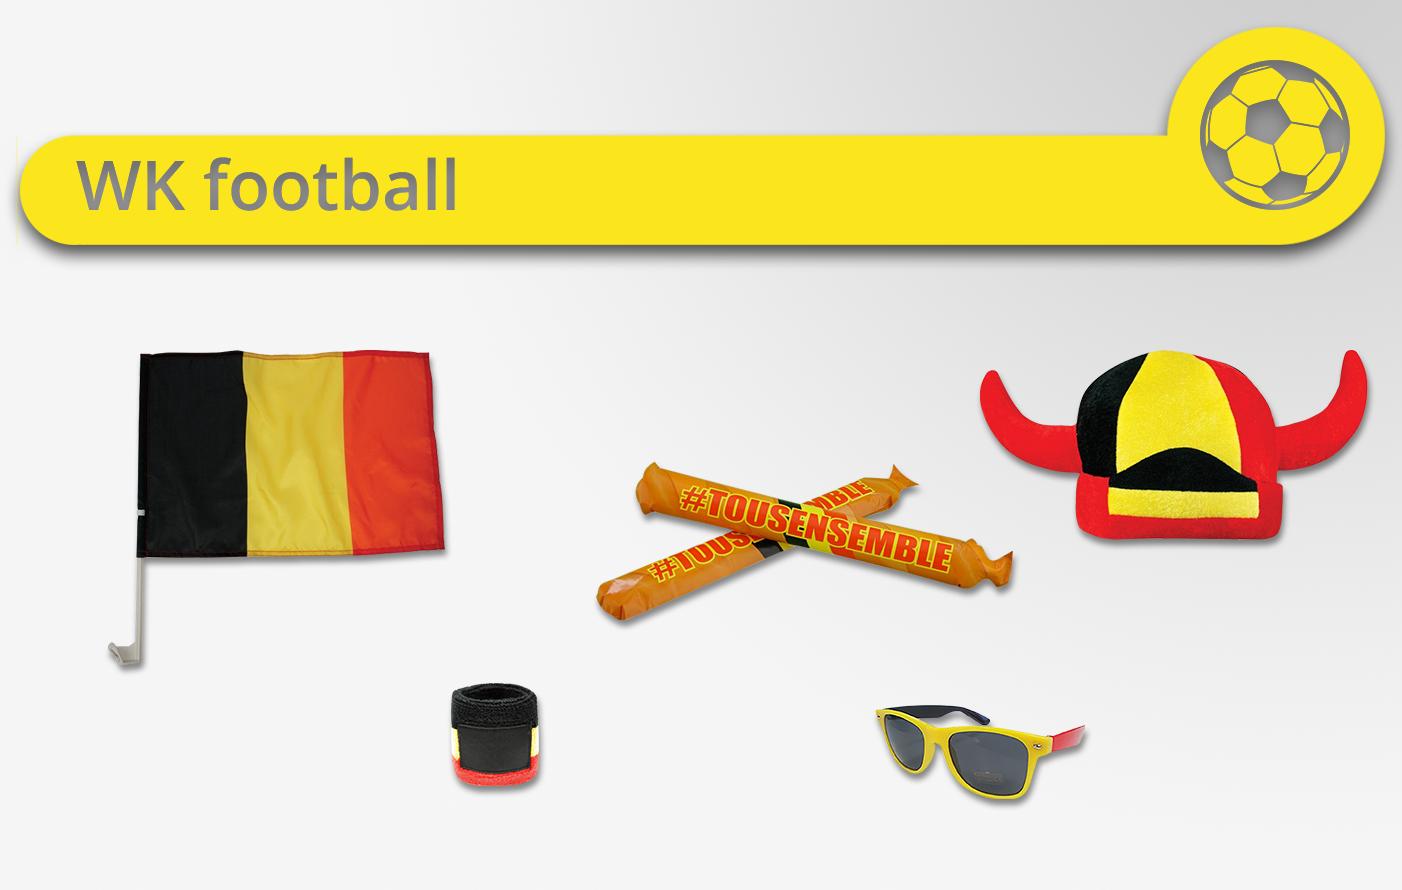 WK football